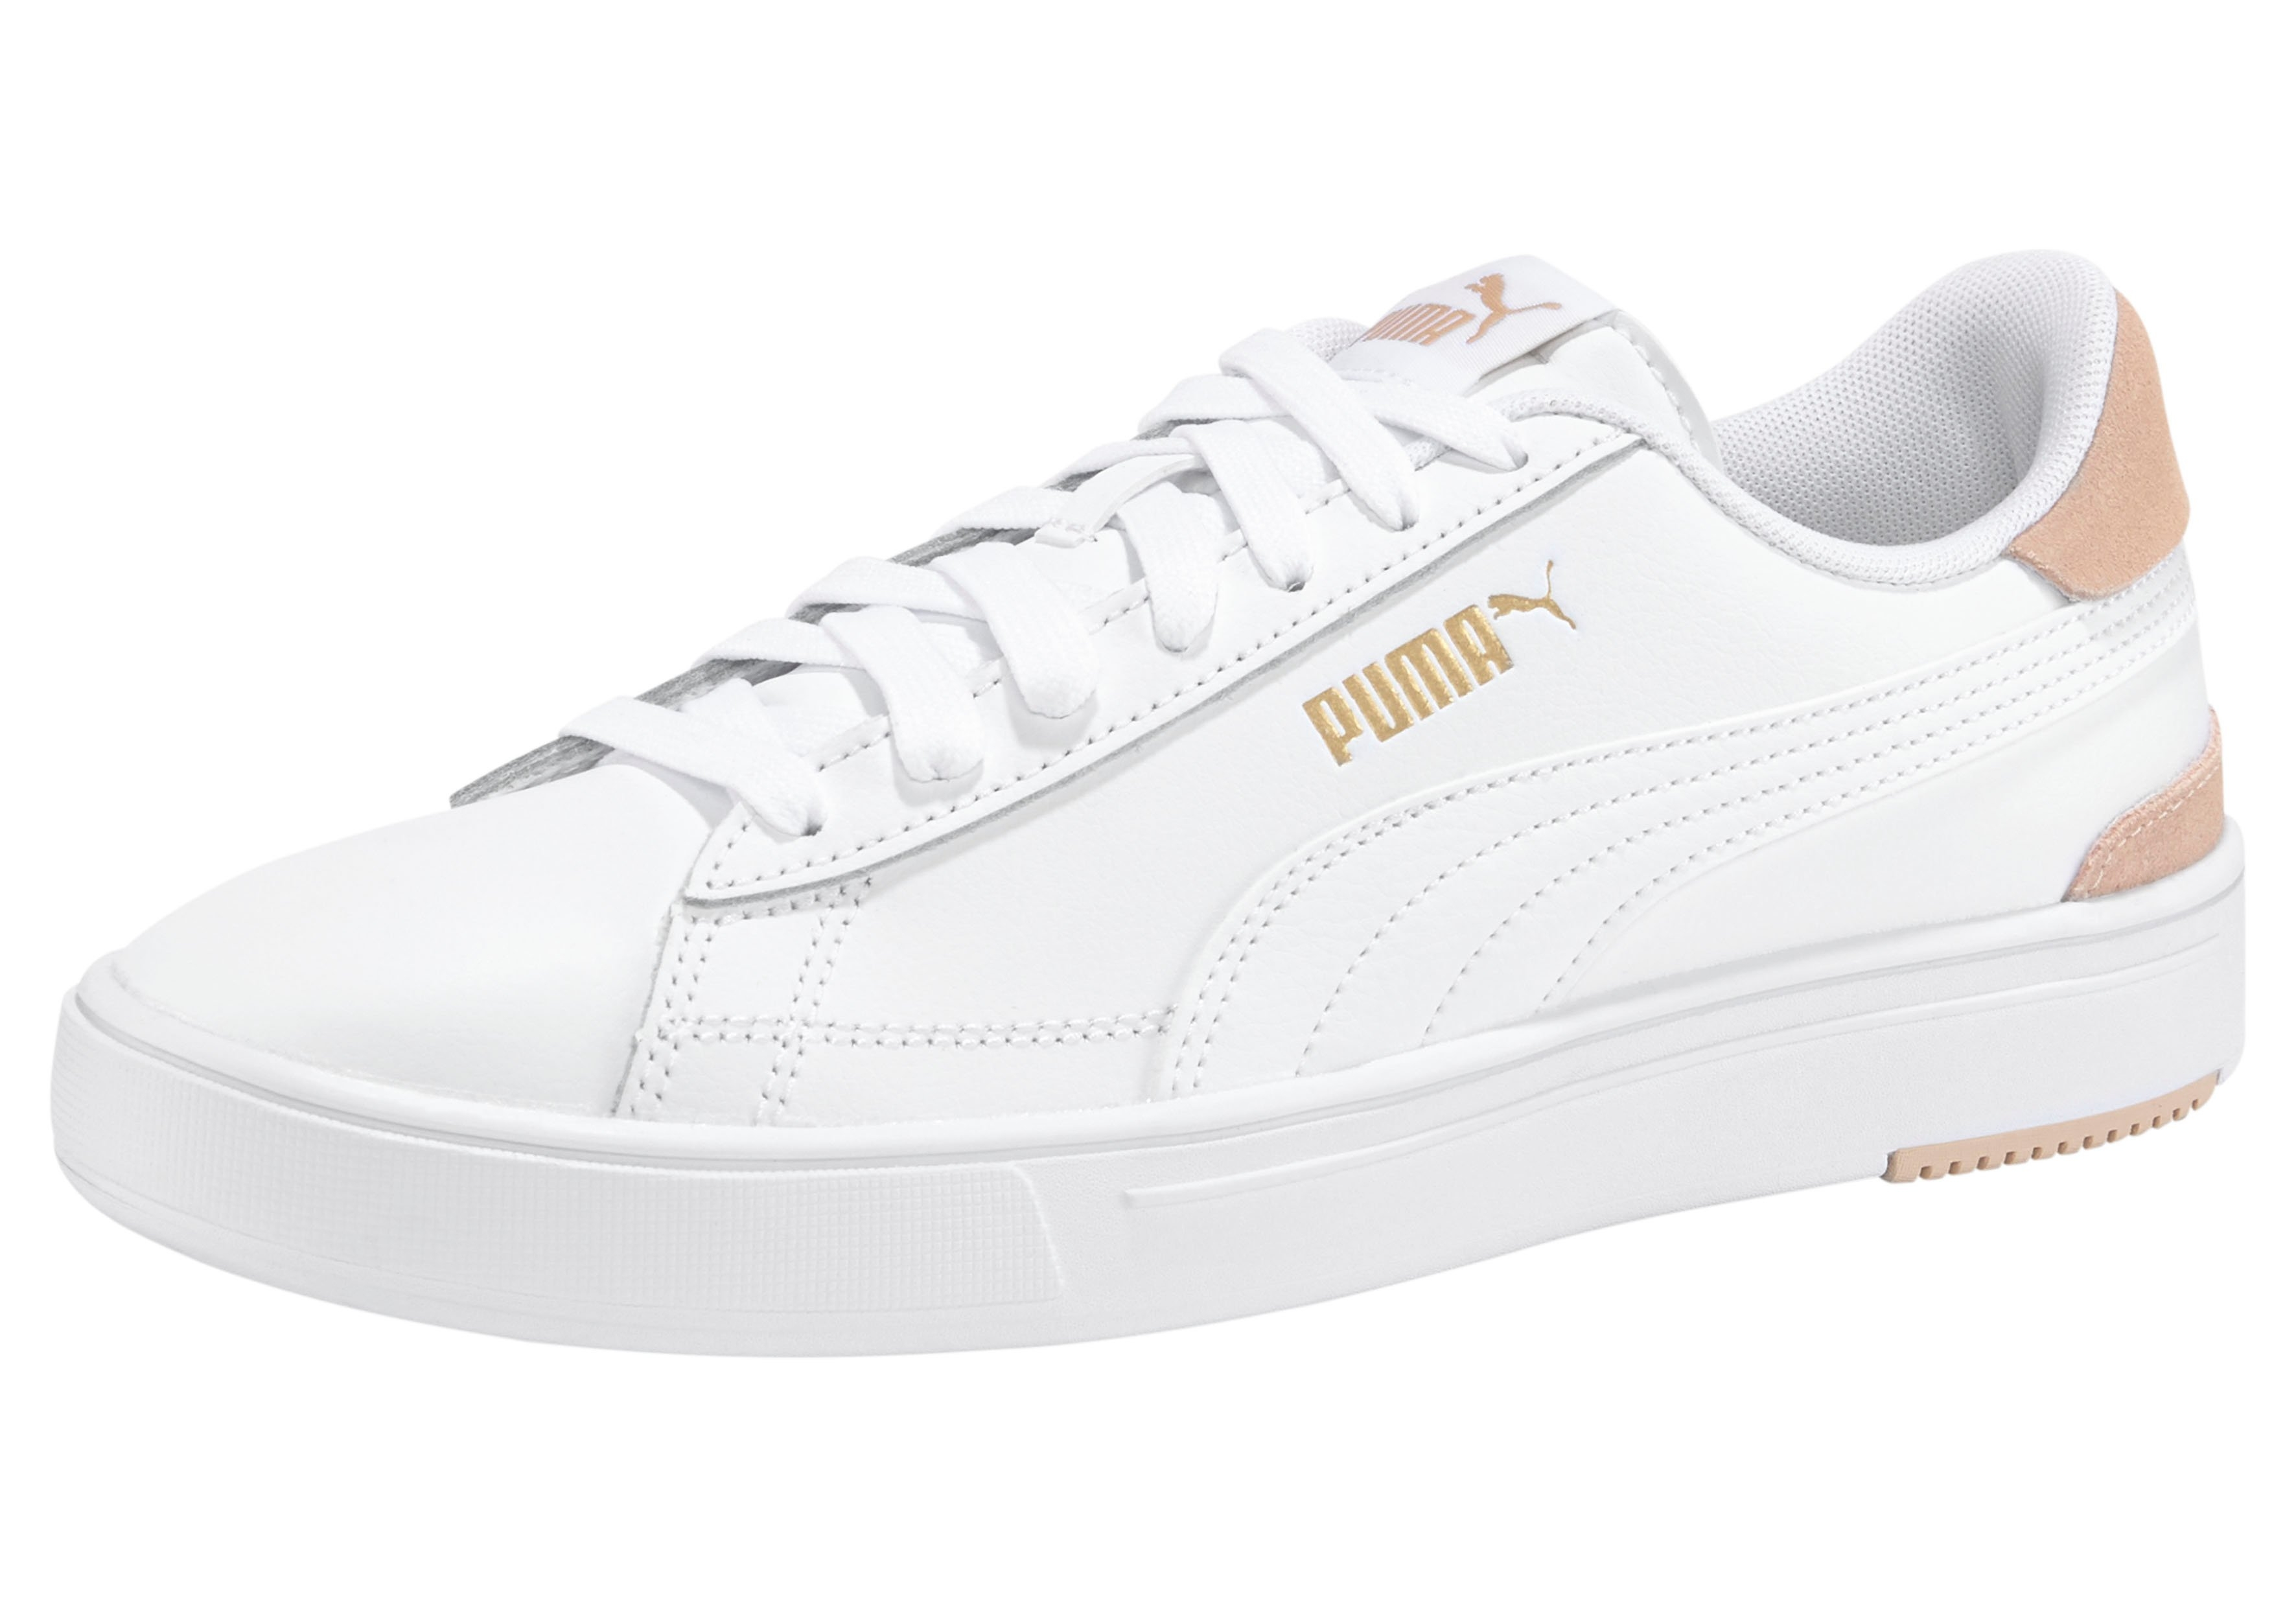 PUMA sneakers Puma Smash Pro goedkoop op otto.nl kopen